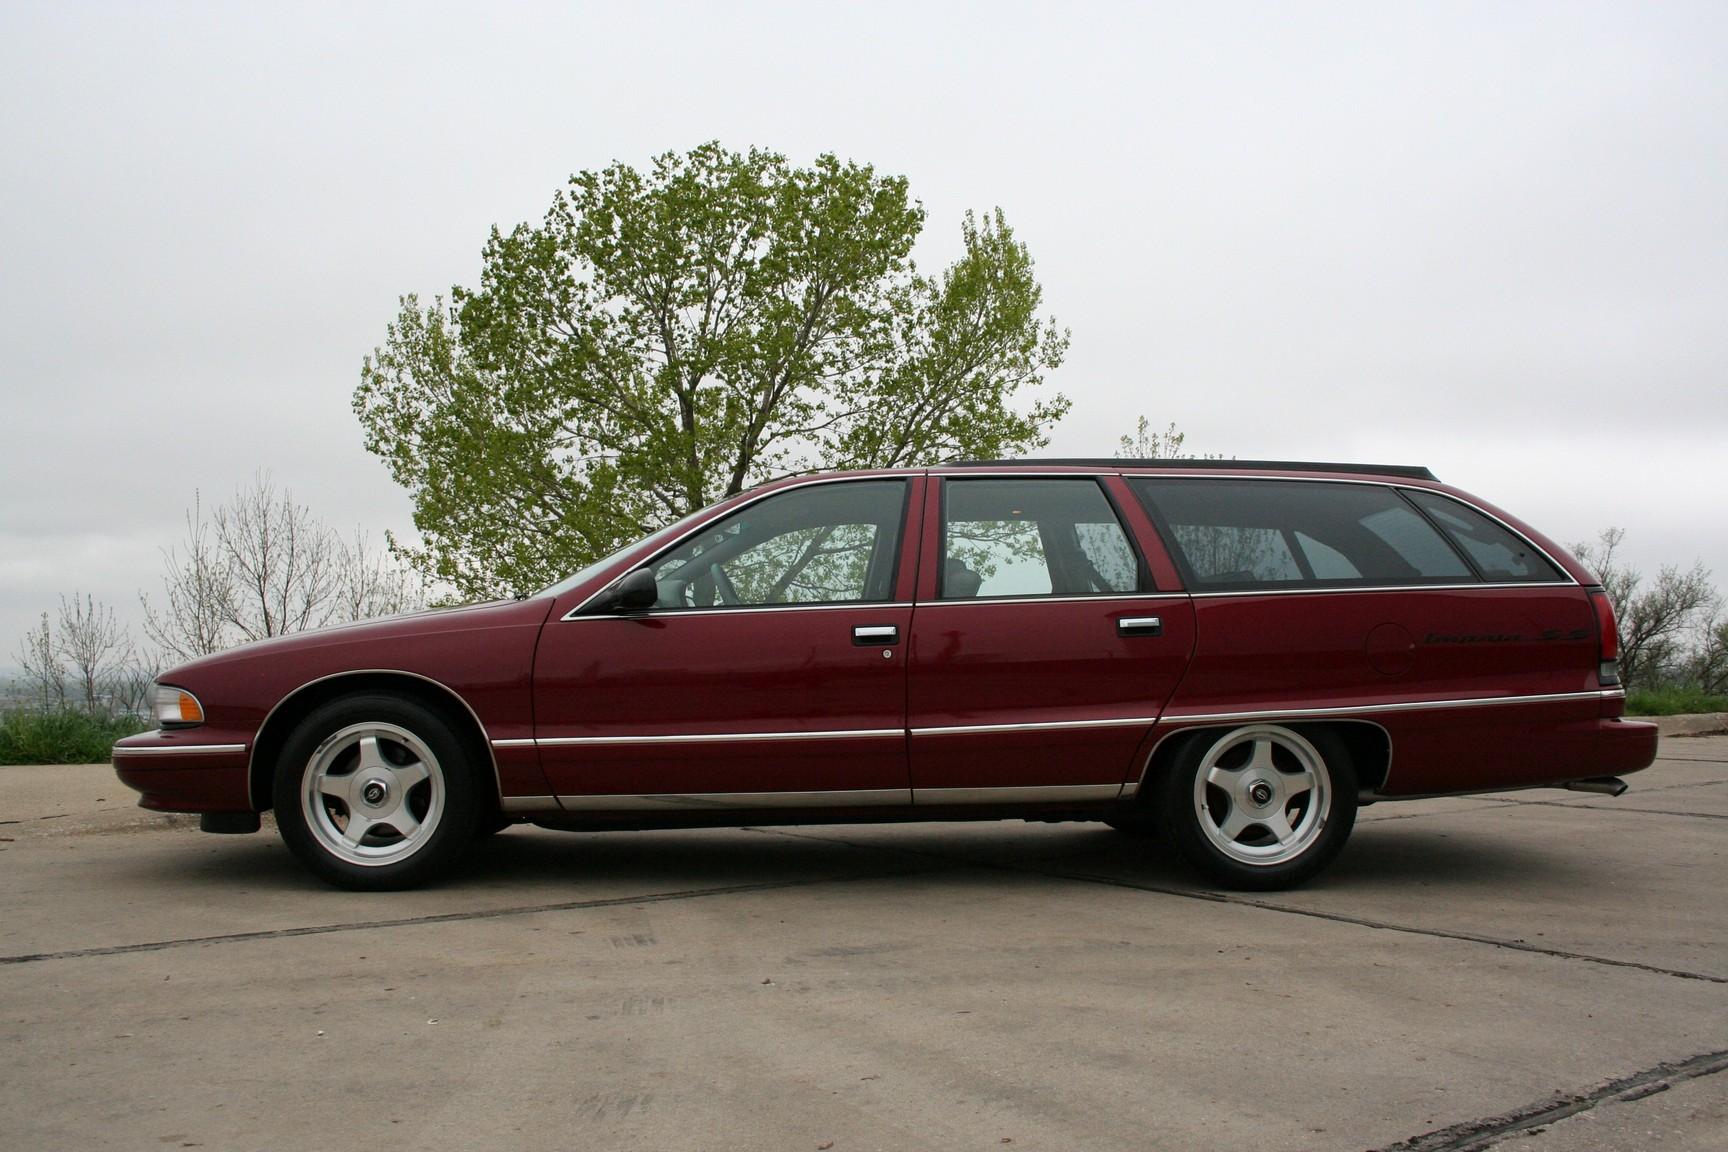 Chevrolet Caprice Classic Under 500 Dollars Down